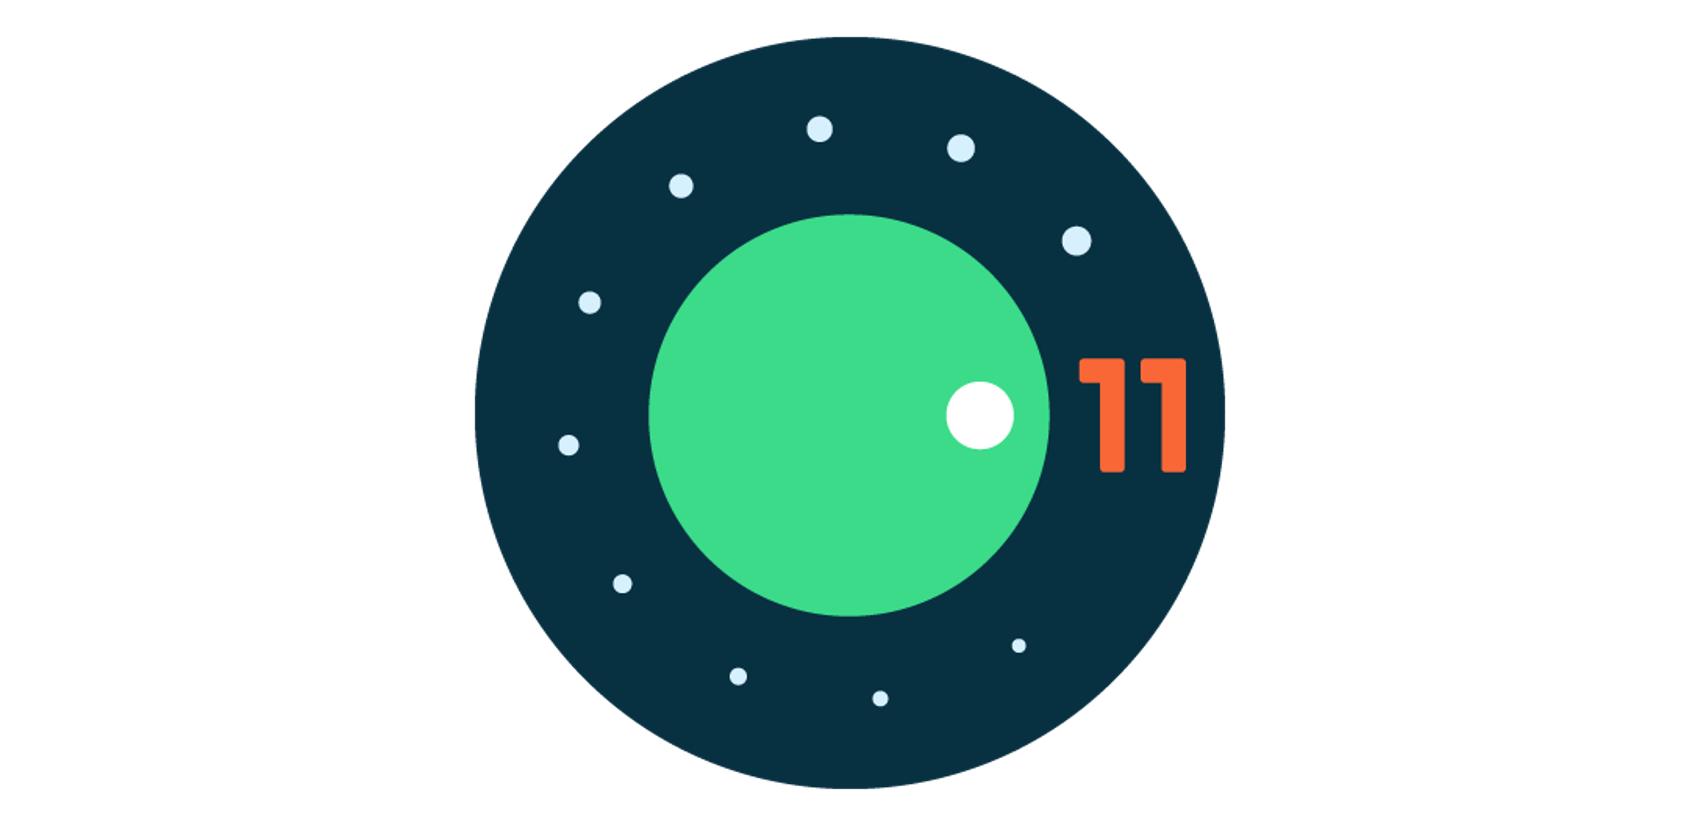 「OnePlus 7/7Pro」向けに「Android 11」ベースの「OxygenOS OpenBeta 1」がリリース